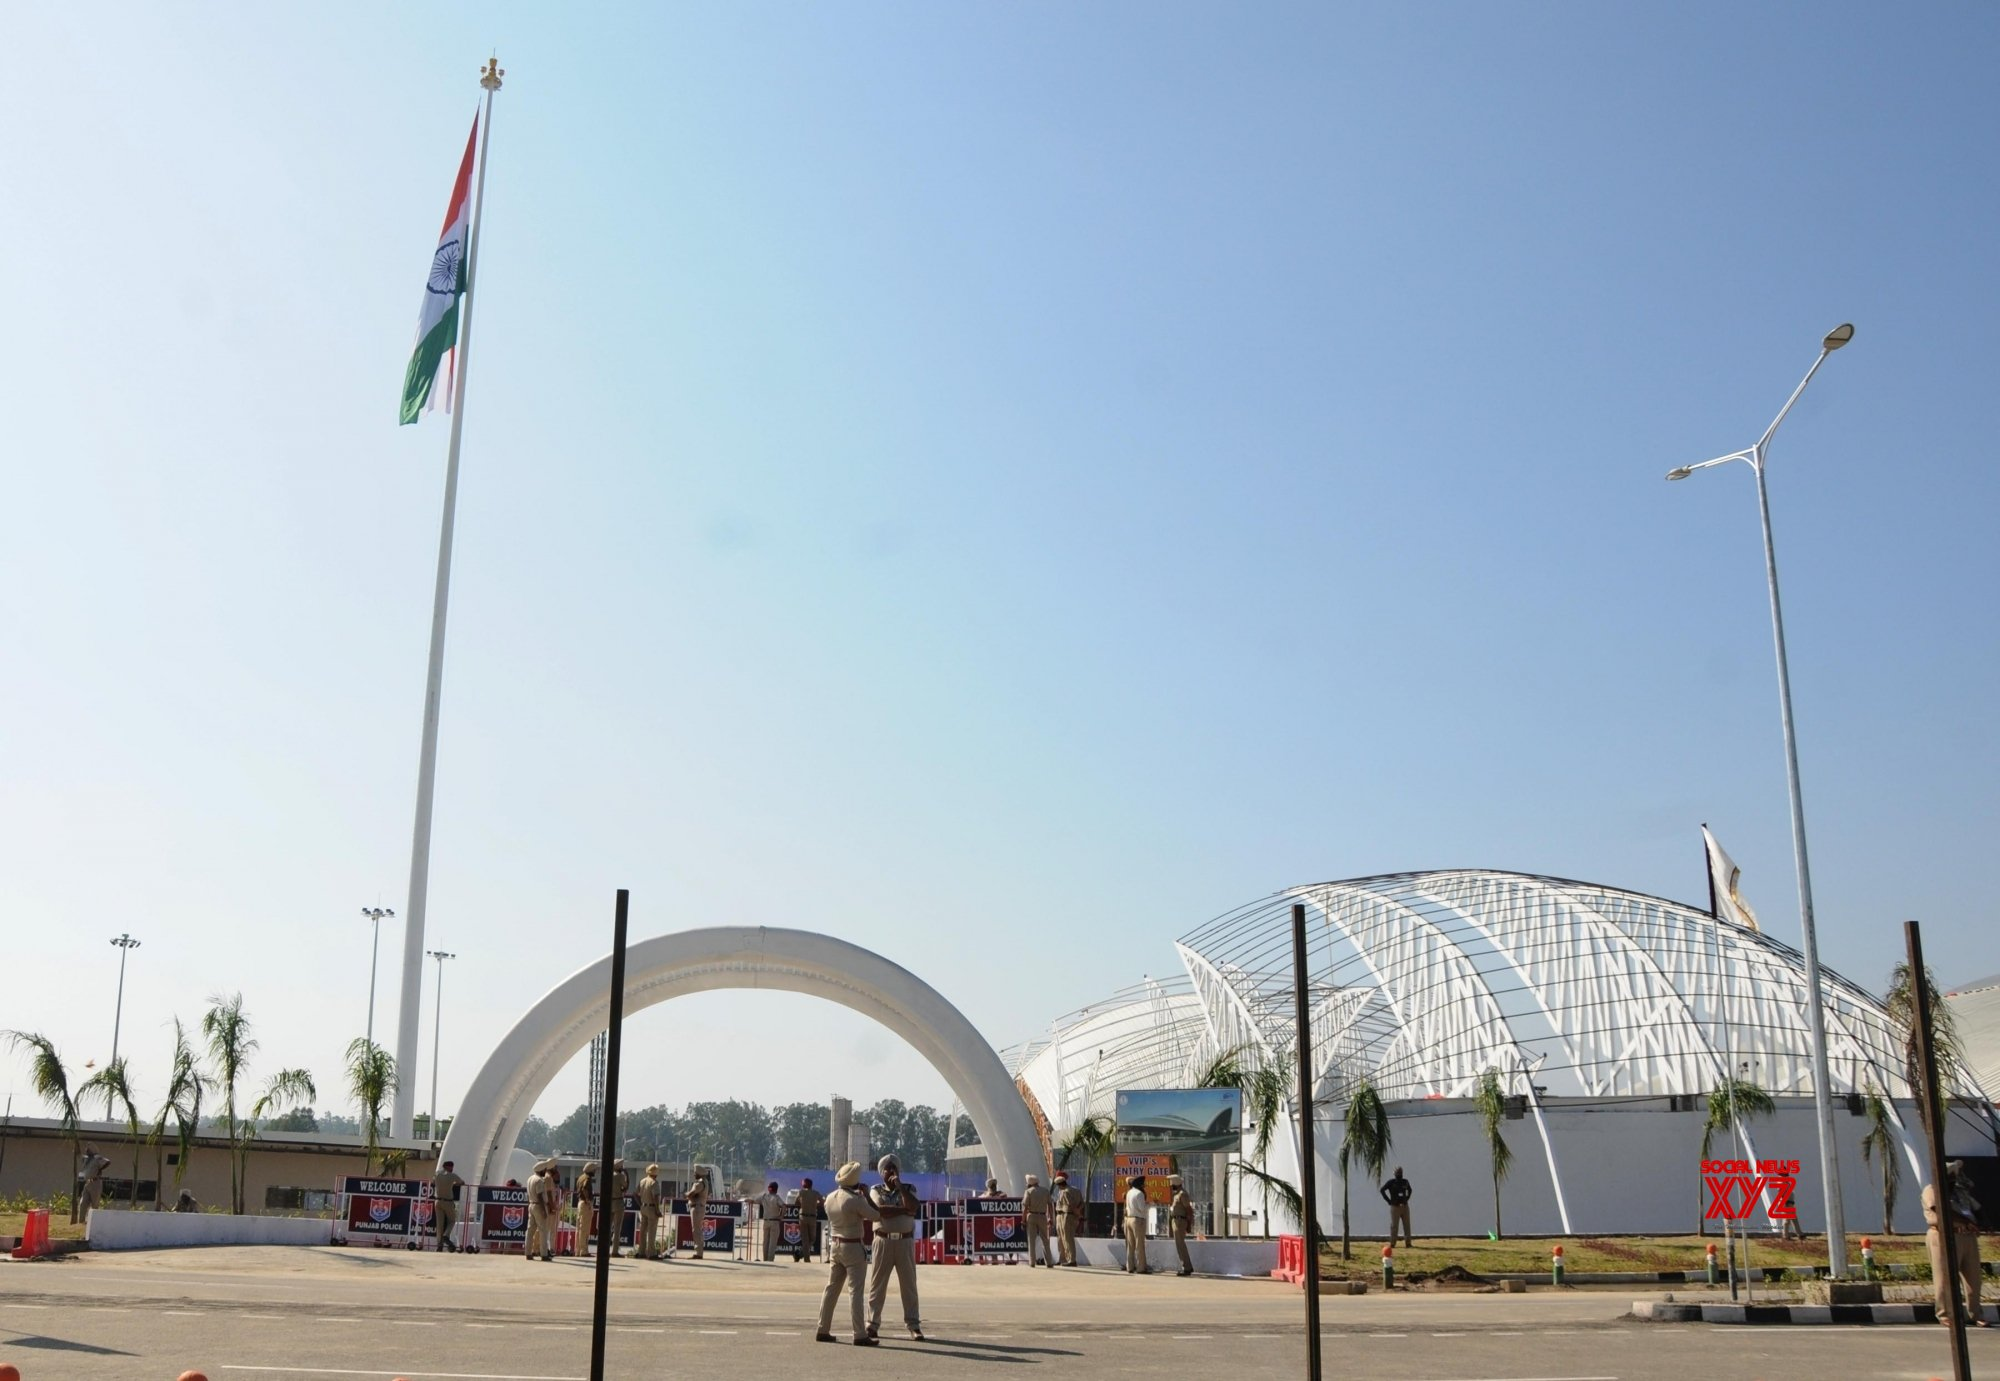 Gurdaspur: Newly inaugurated Integrated Check Post of Kartarpur Corridor in Punjab #Gallery